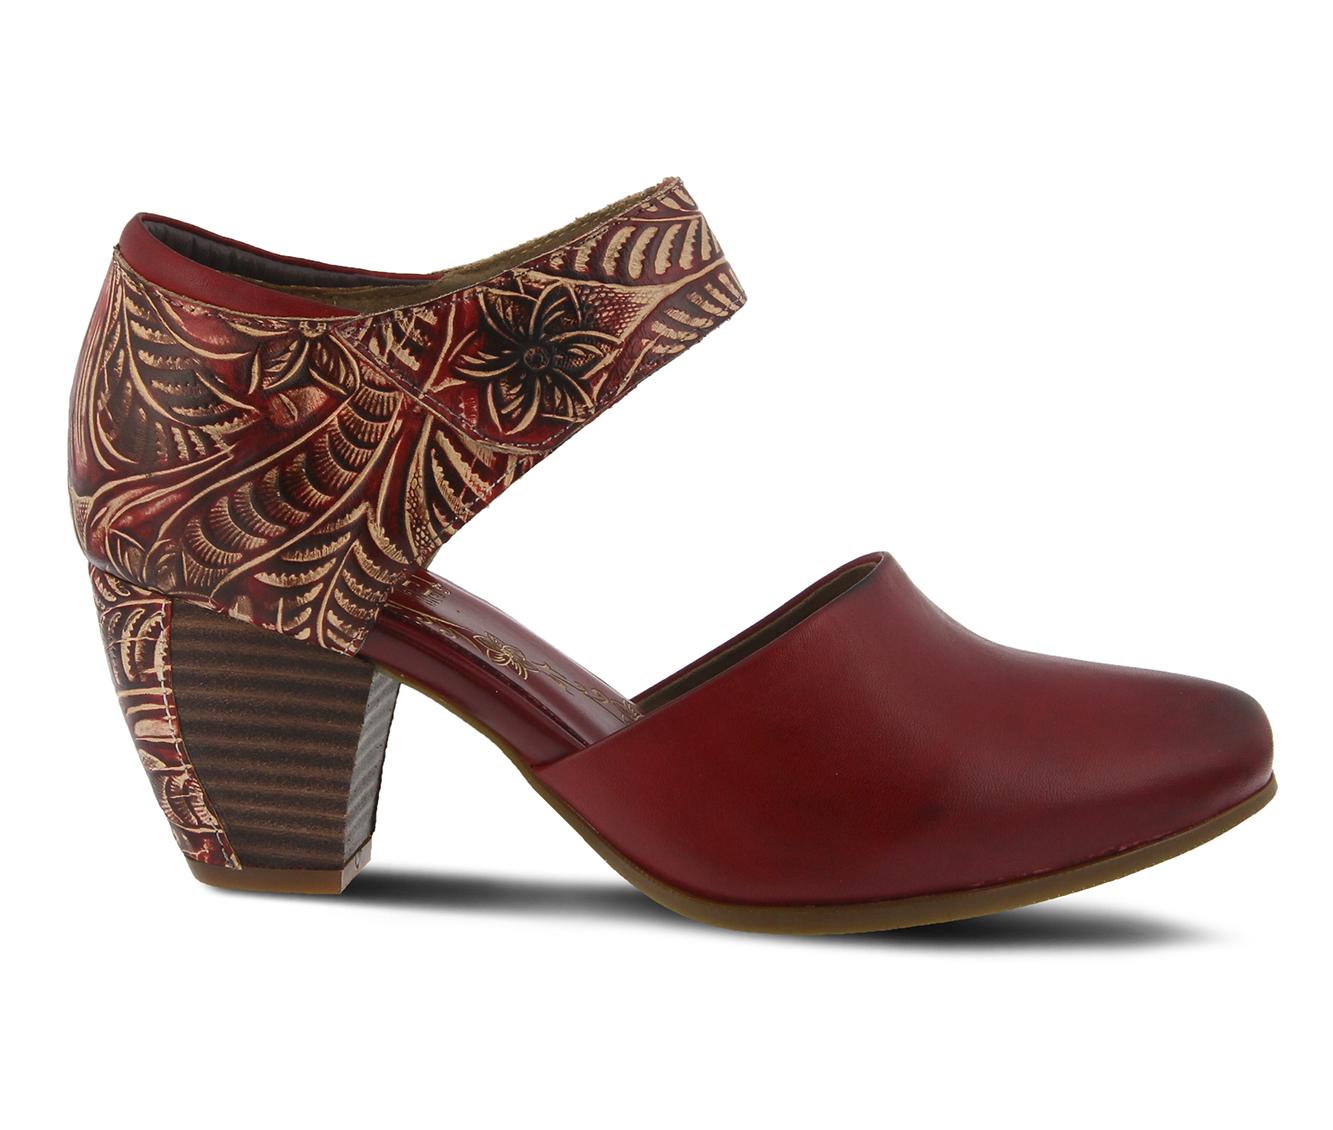 L'Artiste Toolie Women's Dress Shoe (Red Leather)